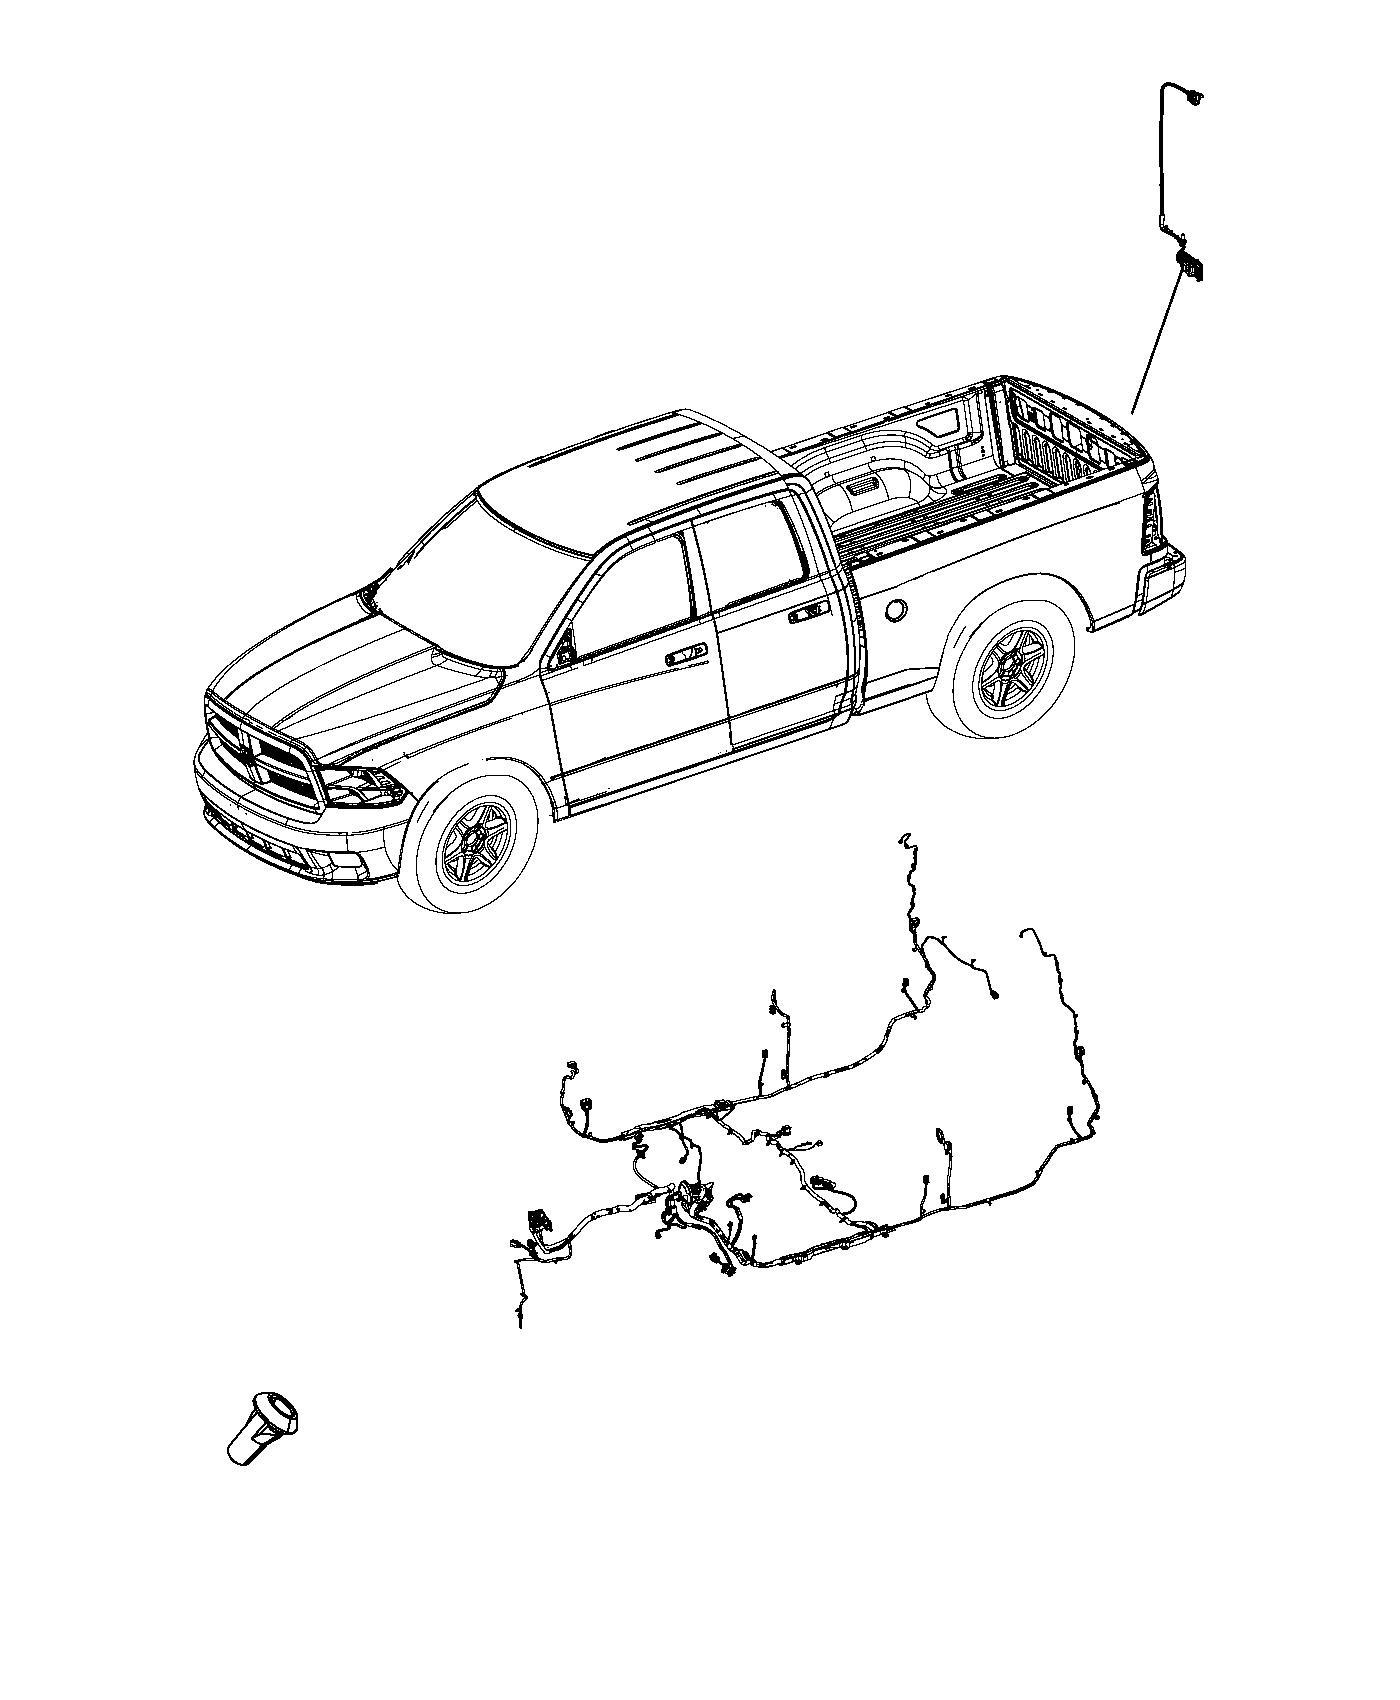 2013 Dodge Ram 1500 Wiring. Body. Rear, window, power